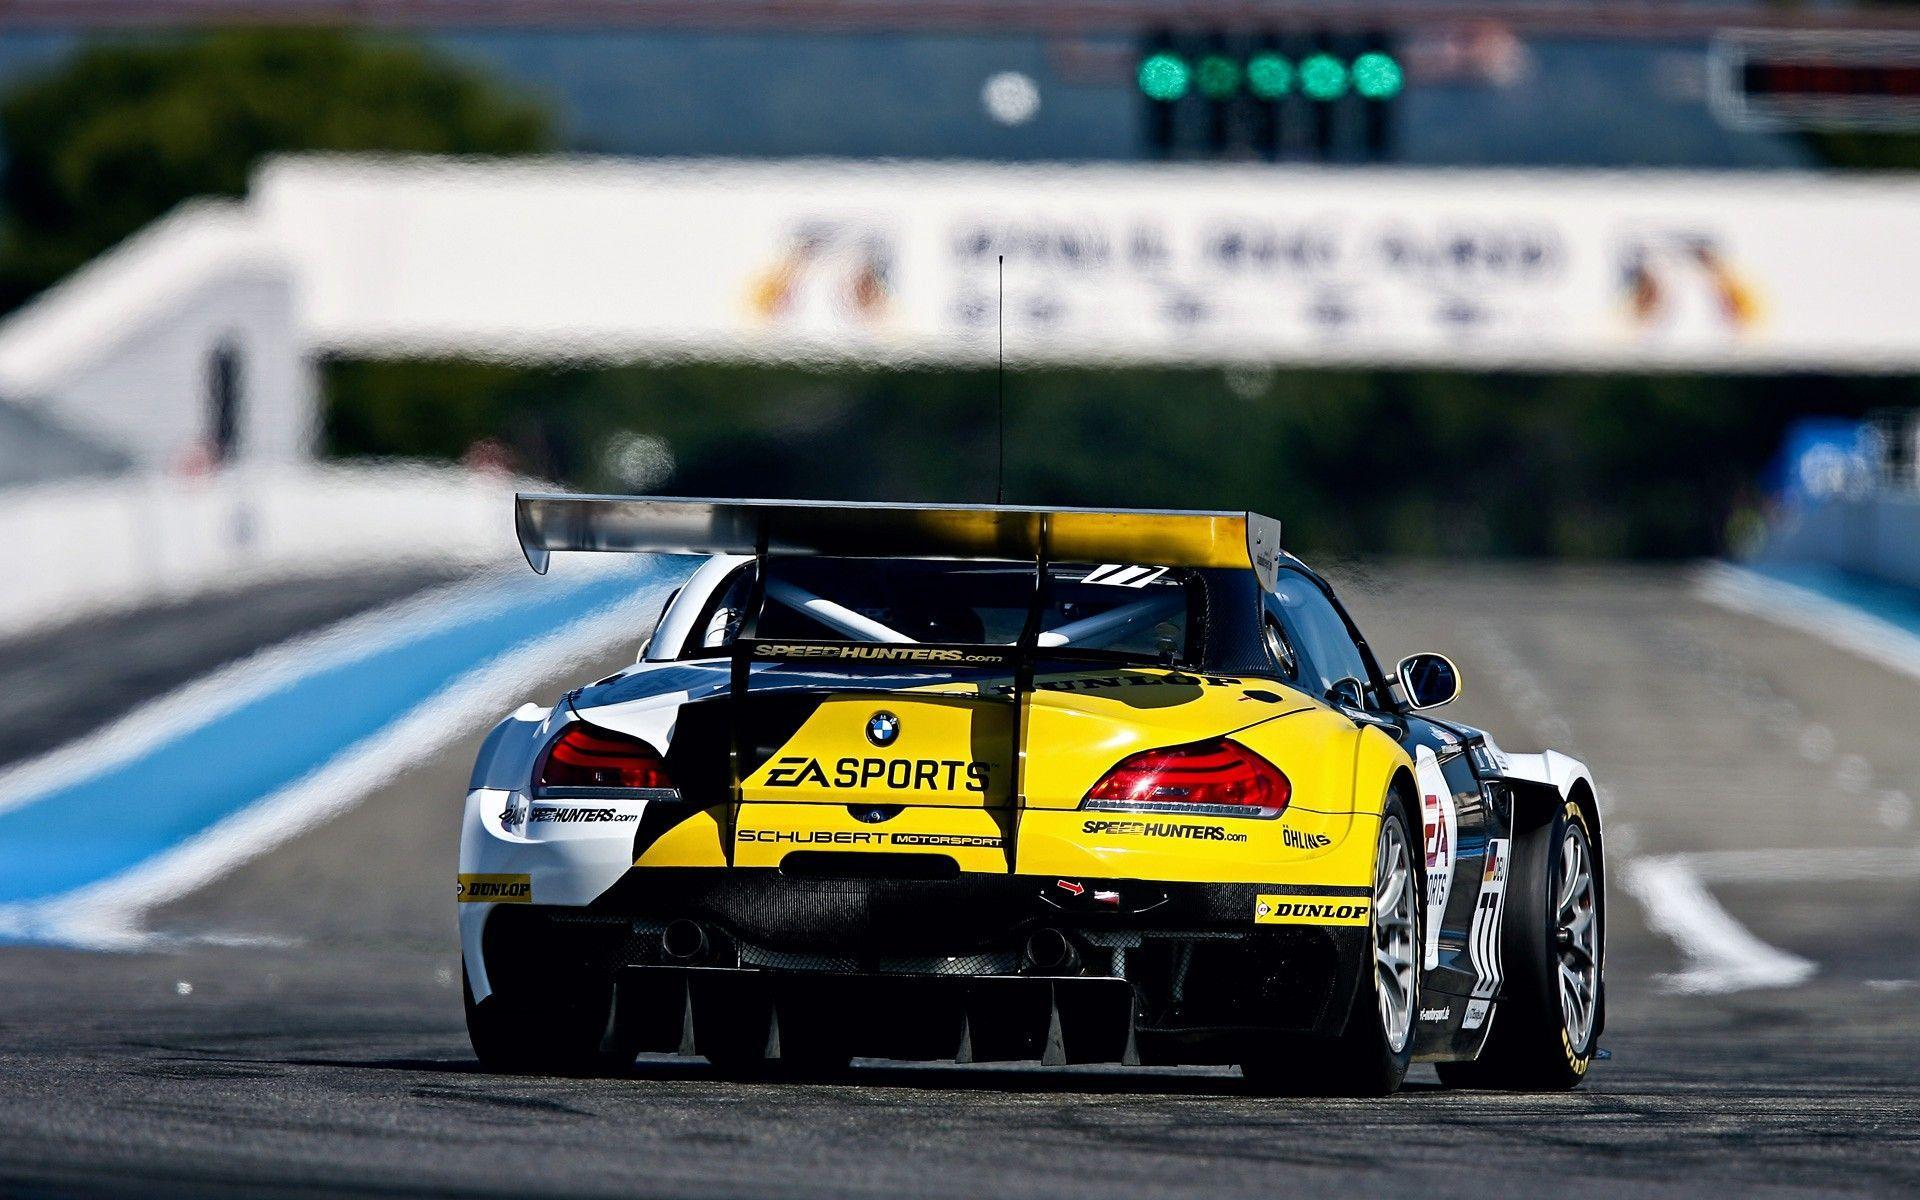 wallpaper racing car office - photo #2